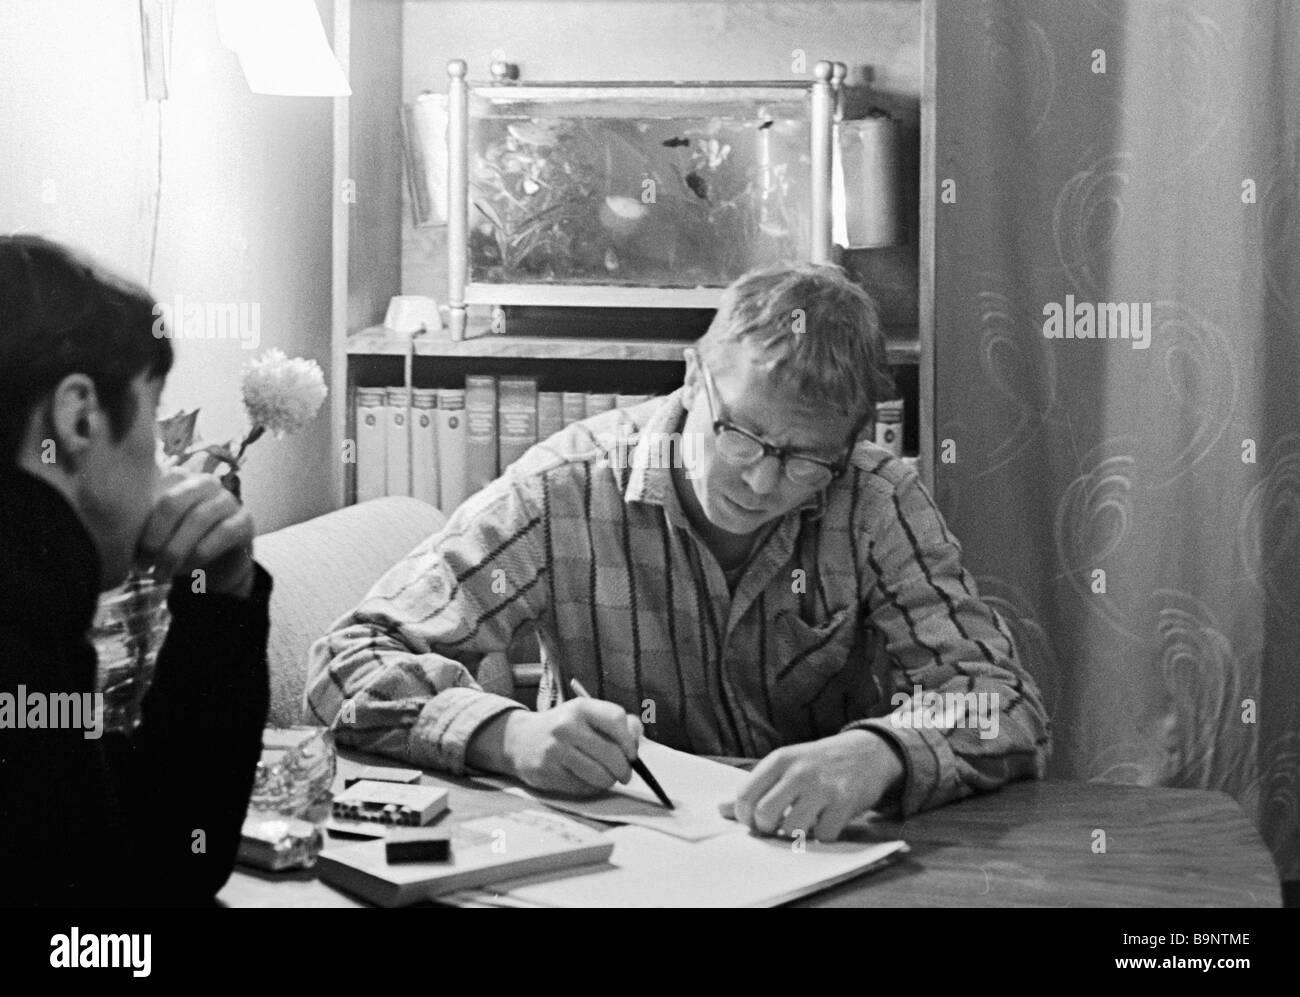 Yury Belov right creates special concert programs for circus performer Leonid Yengibarov left - Stock Image